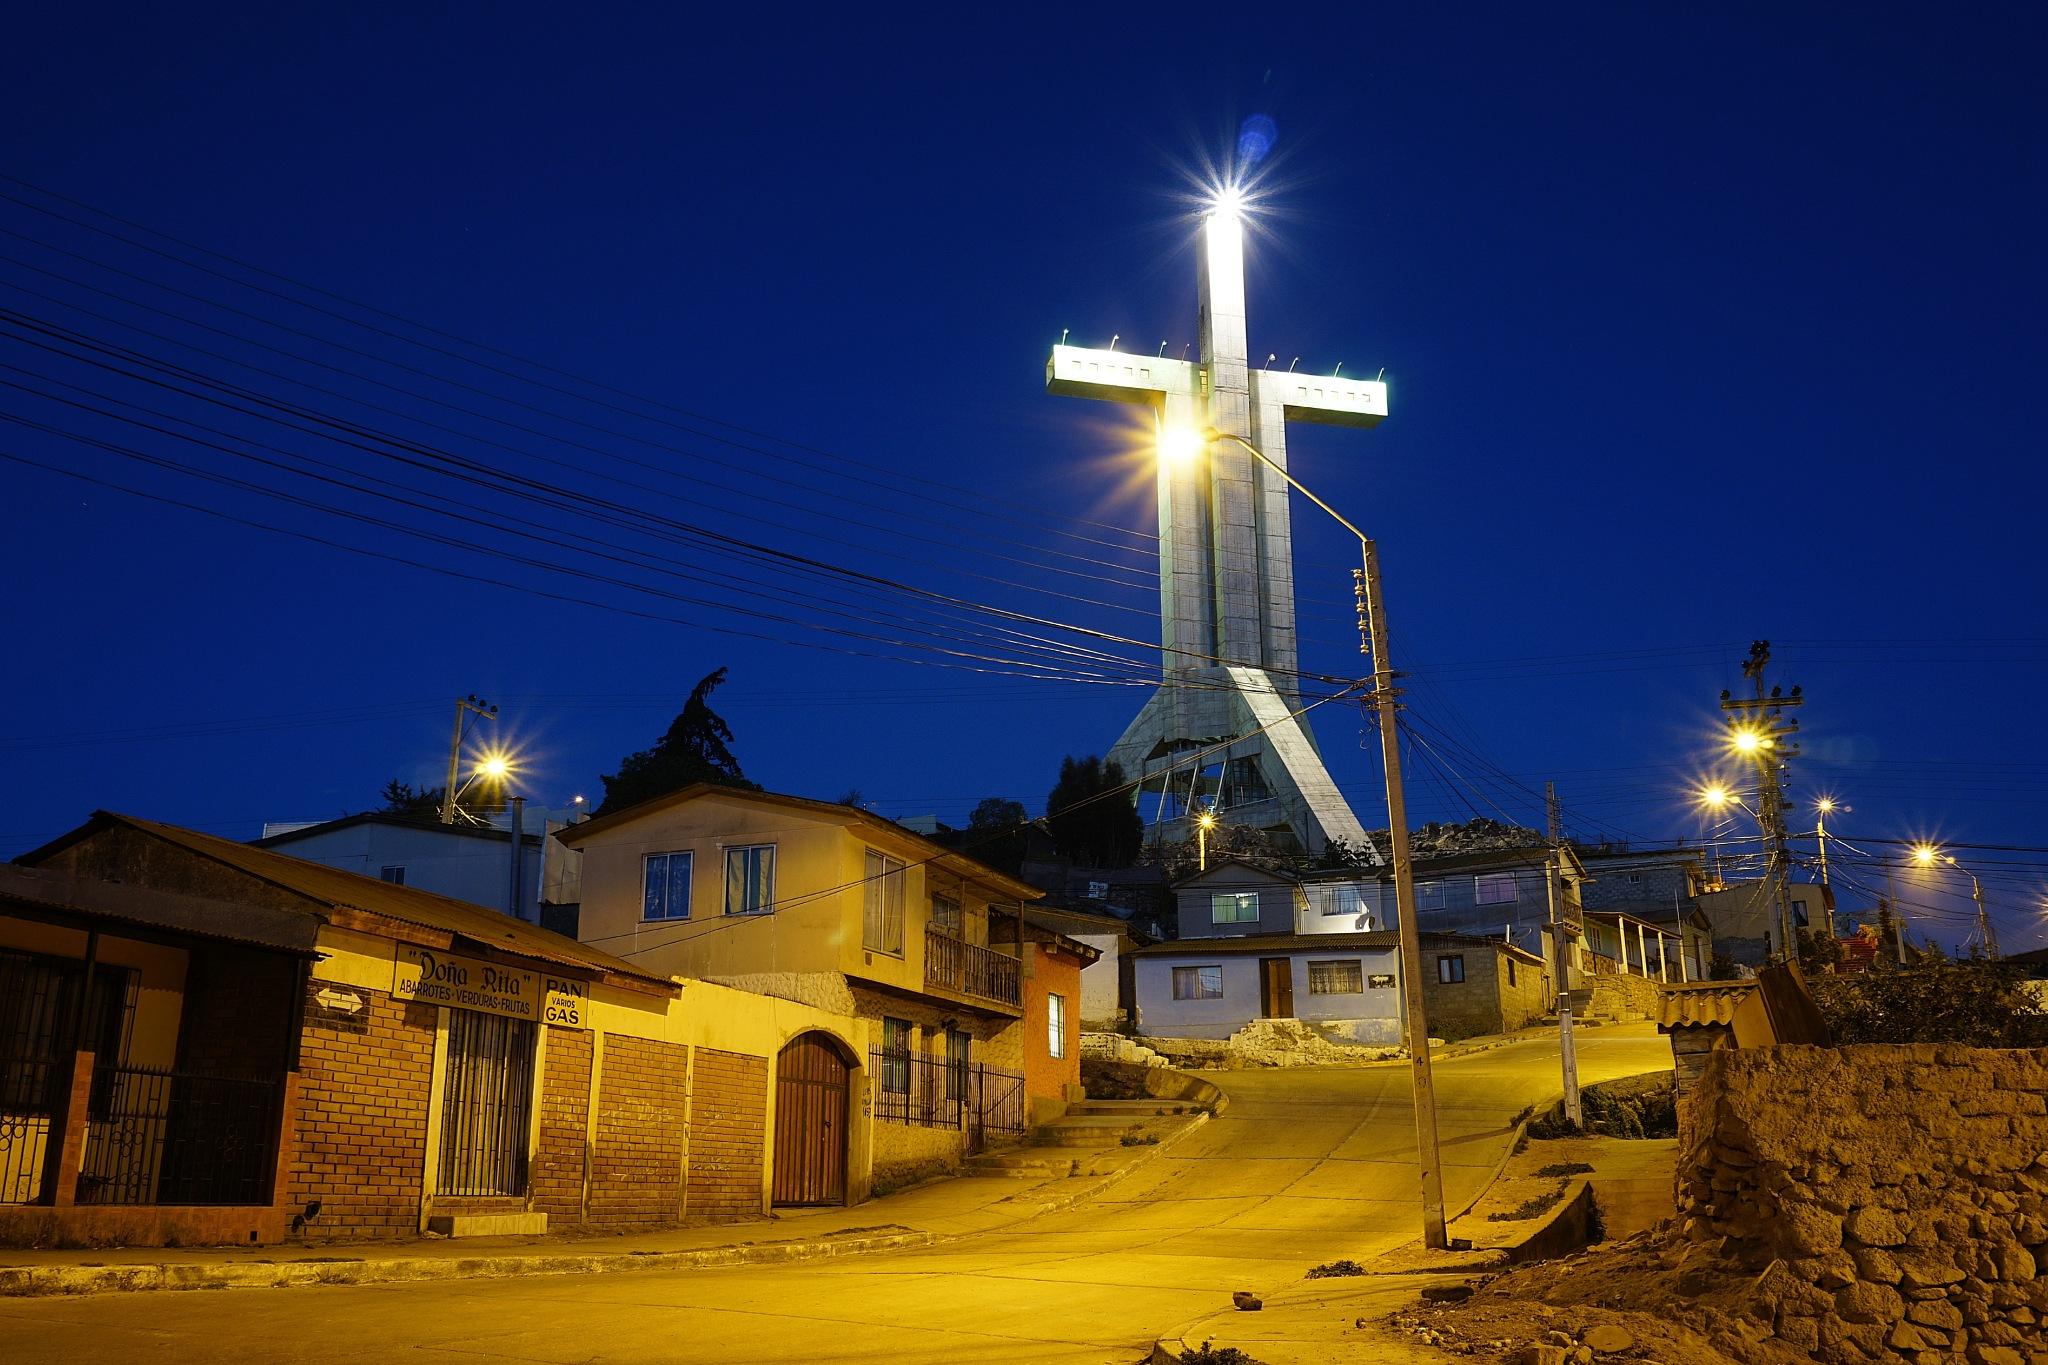 Cruz del Tercer Milenium by Marcelo Lorca